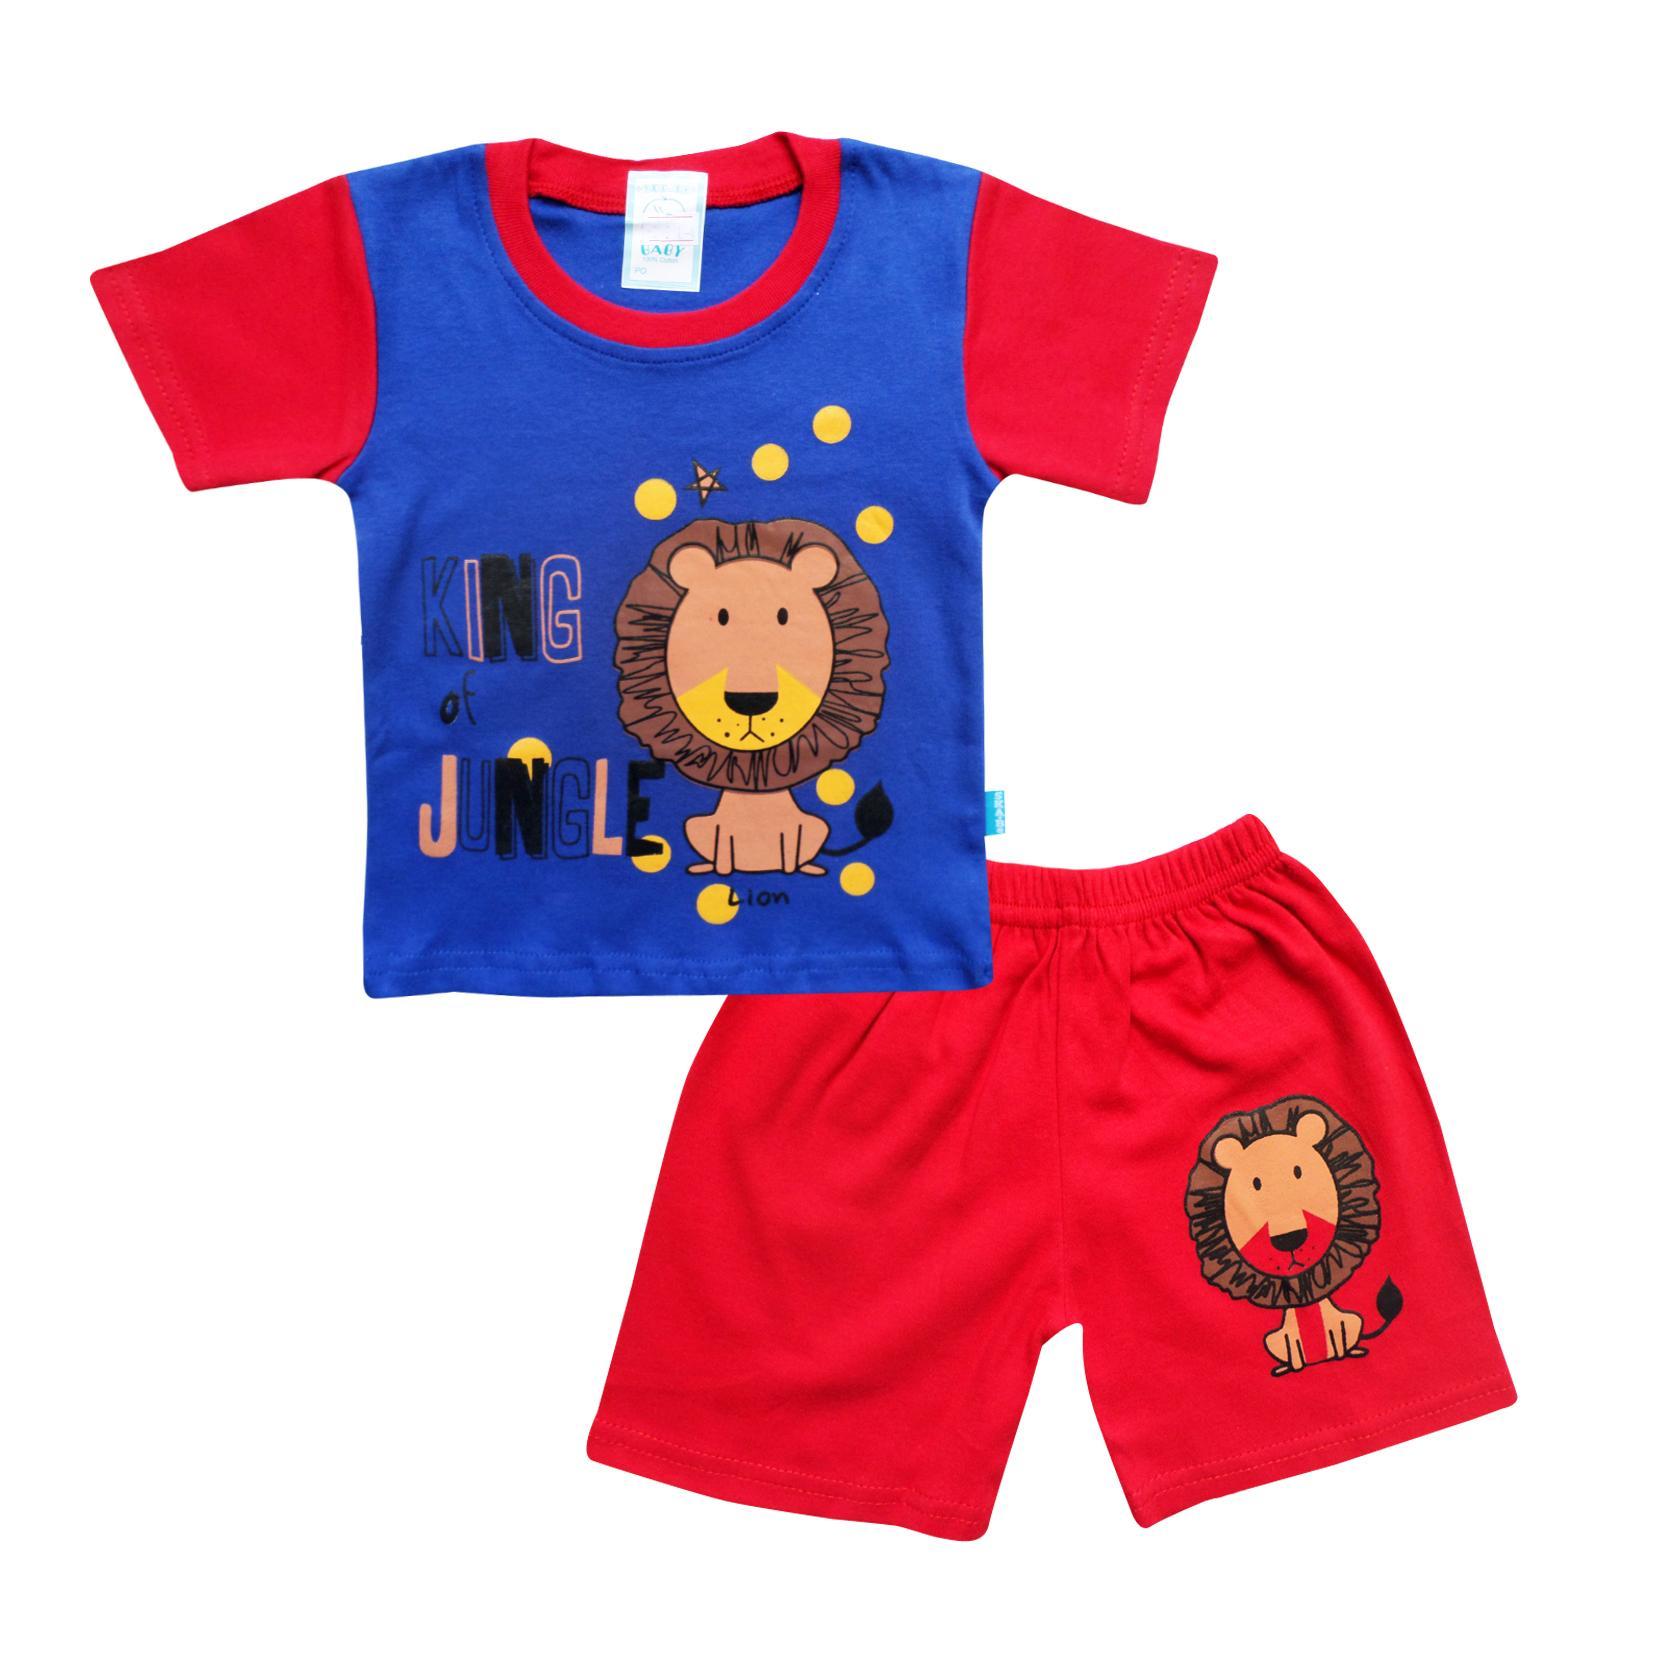 Kumpulan Harga Setelan Baju Baby November 2018 Lengkap Katalog Kaos Anak Tangan Pendek Skabe W Tua Oblong Bayi Laki 2284